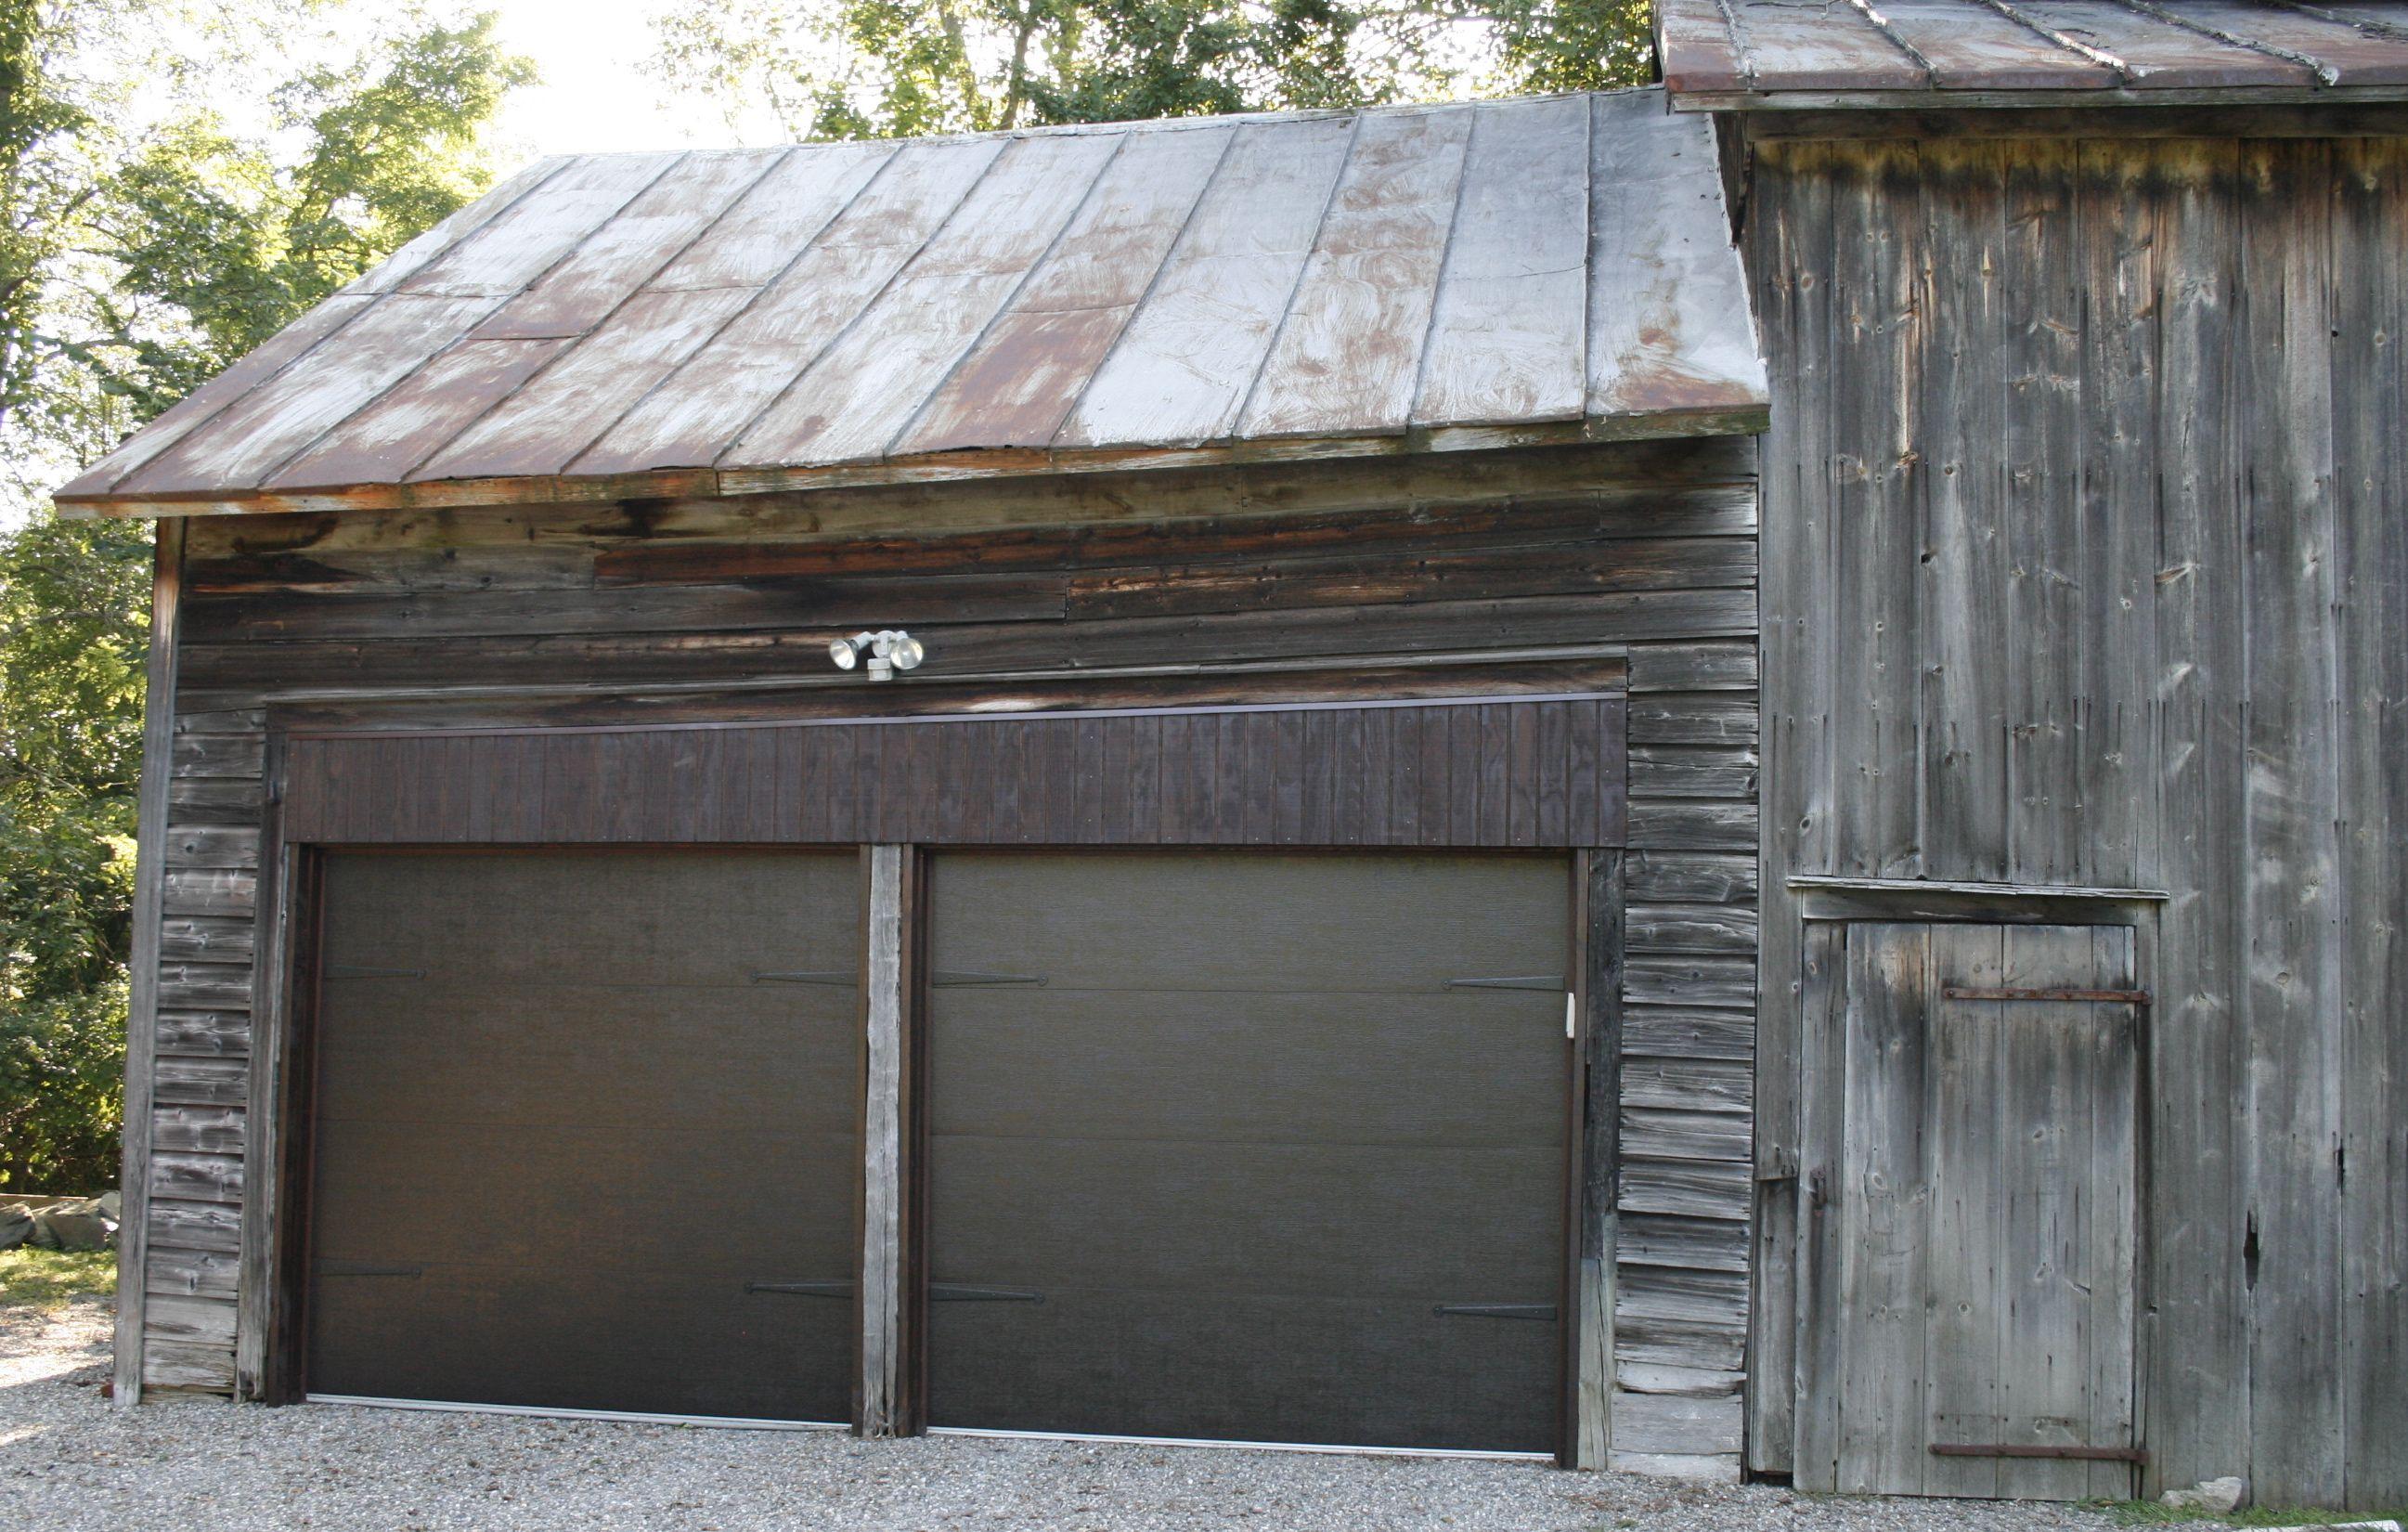 Raynor Accufinish Overhead Door Walnut Flush Panel Dutchess OVerhead Doors